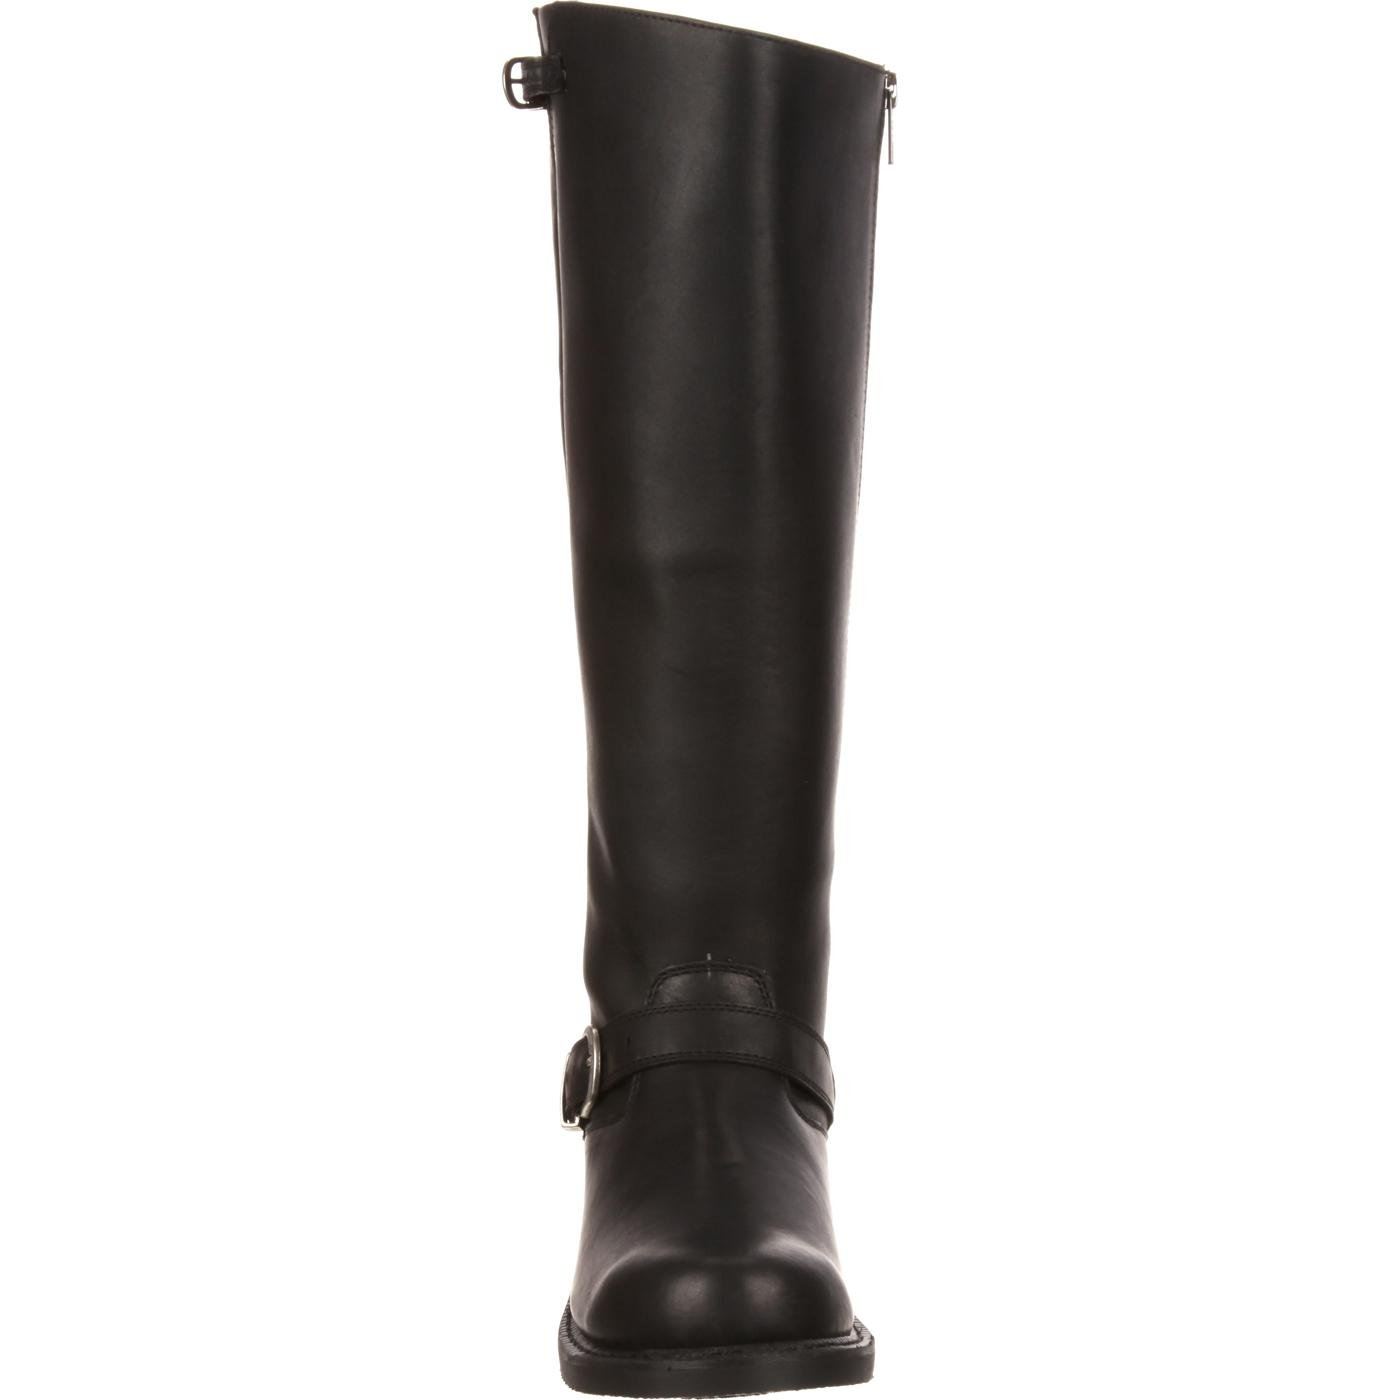 92bc2990d Images. Durango City Women's SoHo Engineer Boot ...